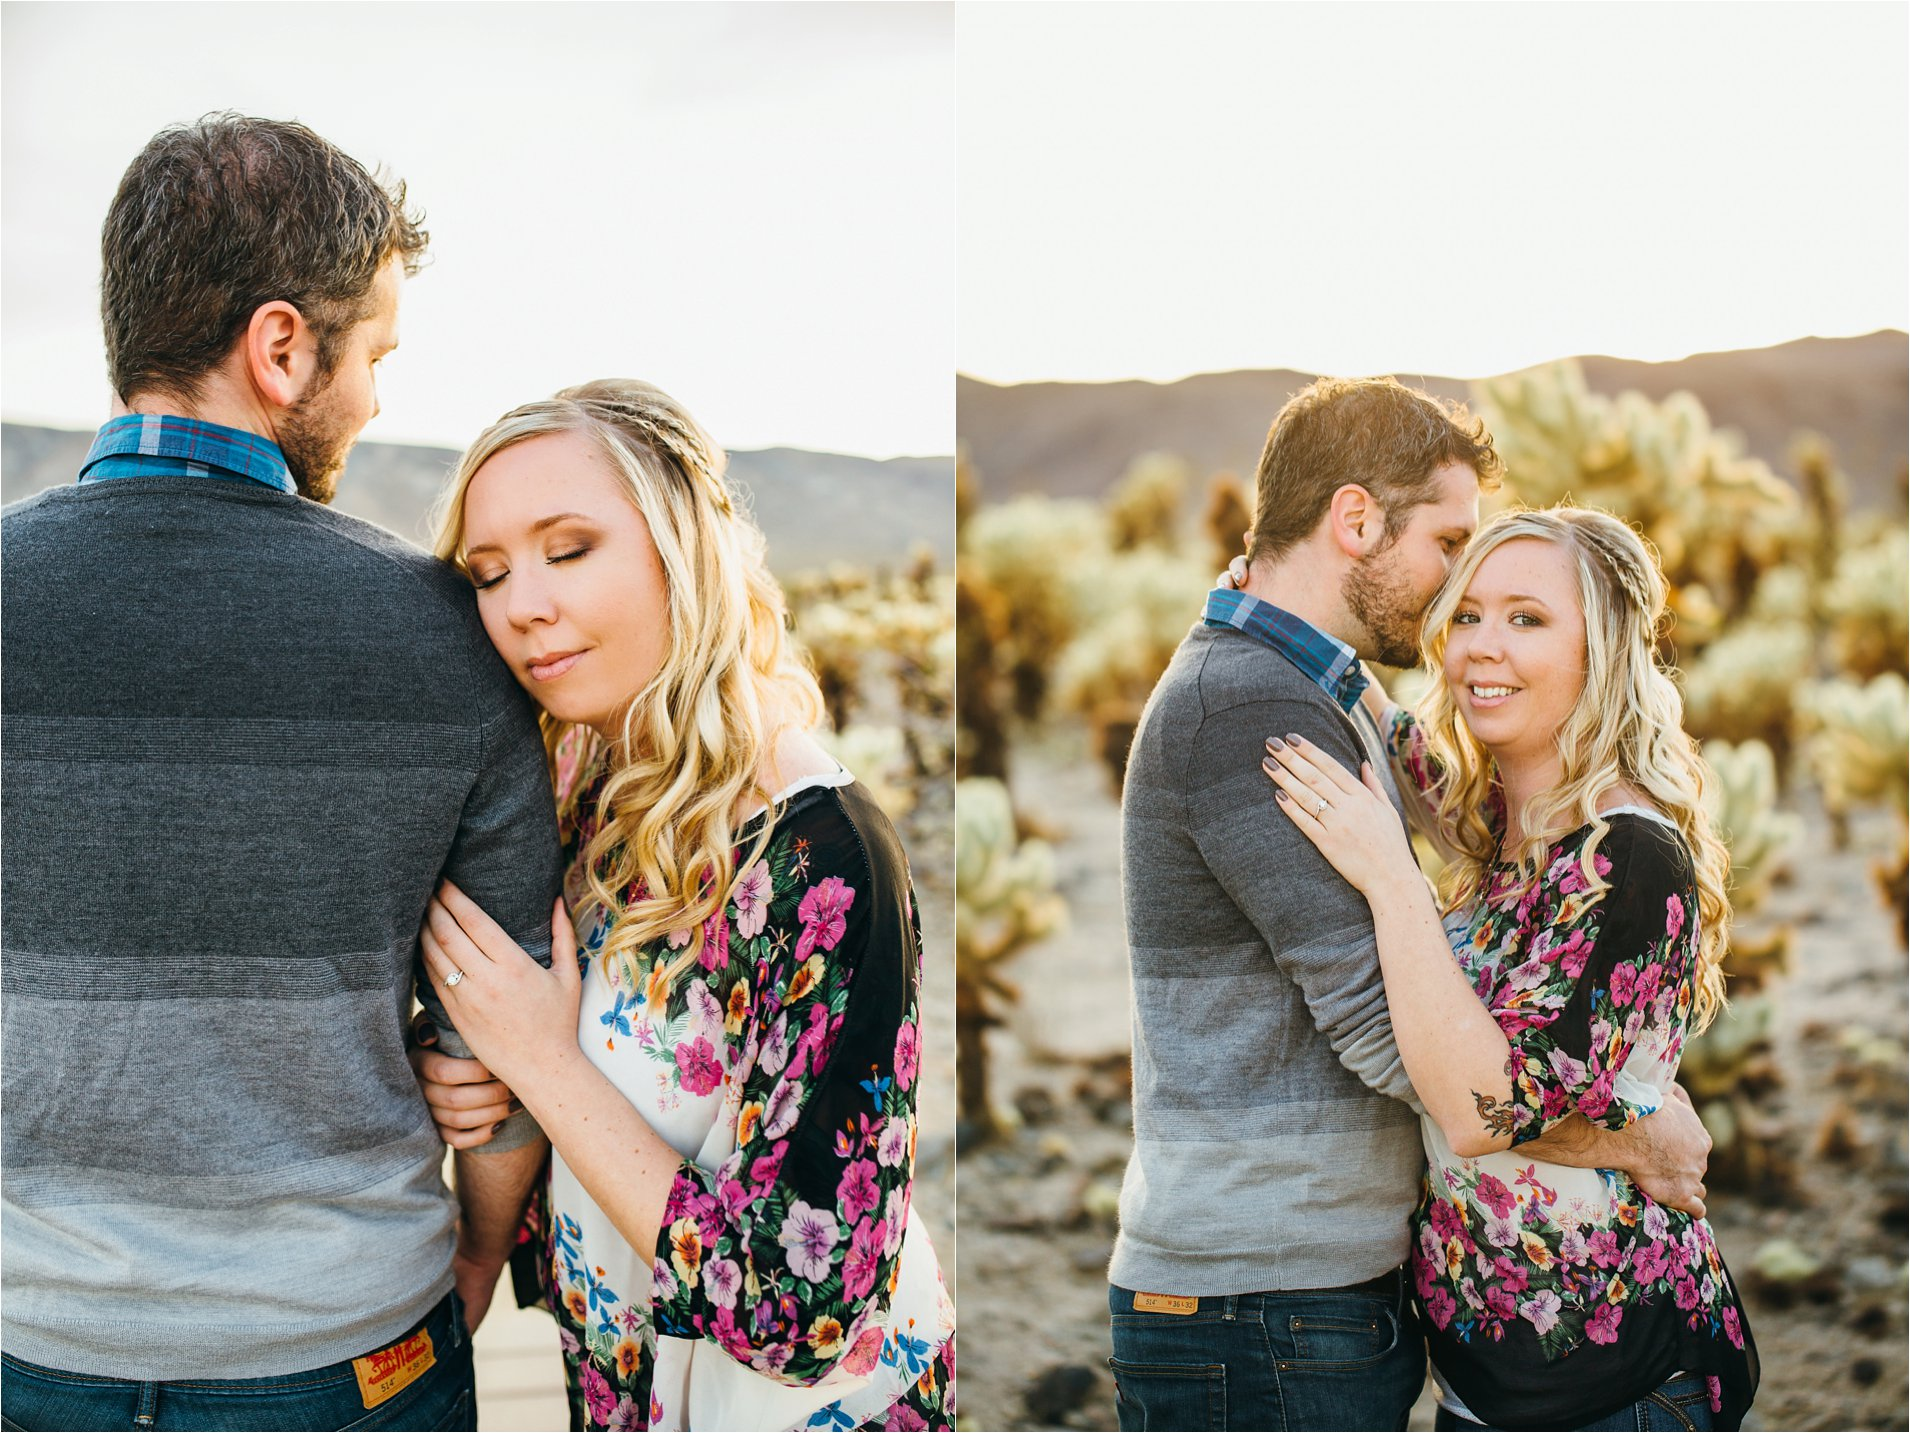 Engagement Photos in Joshua Tree